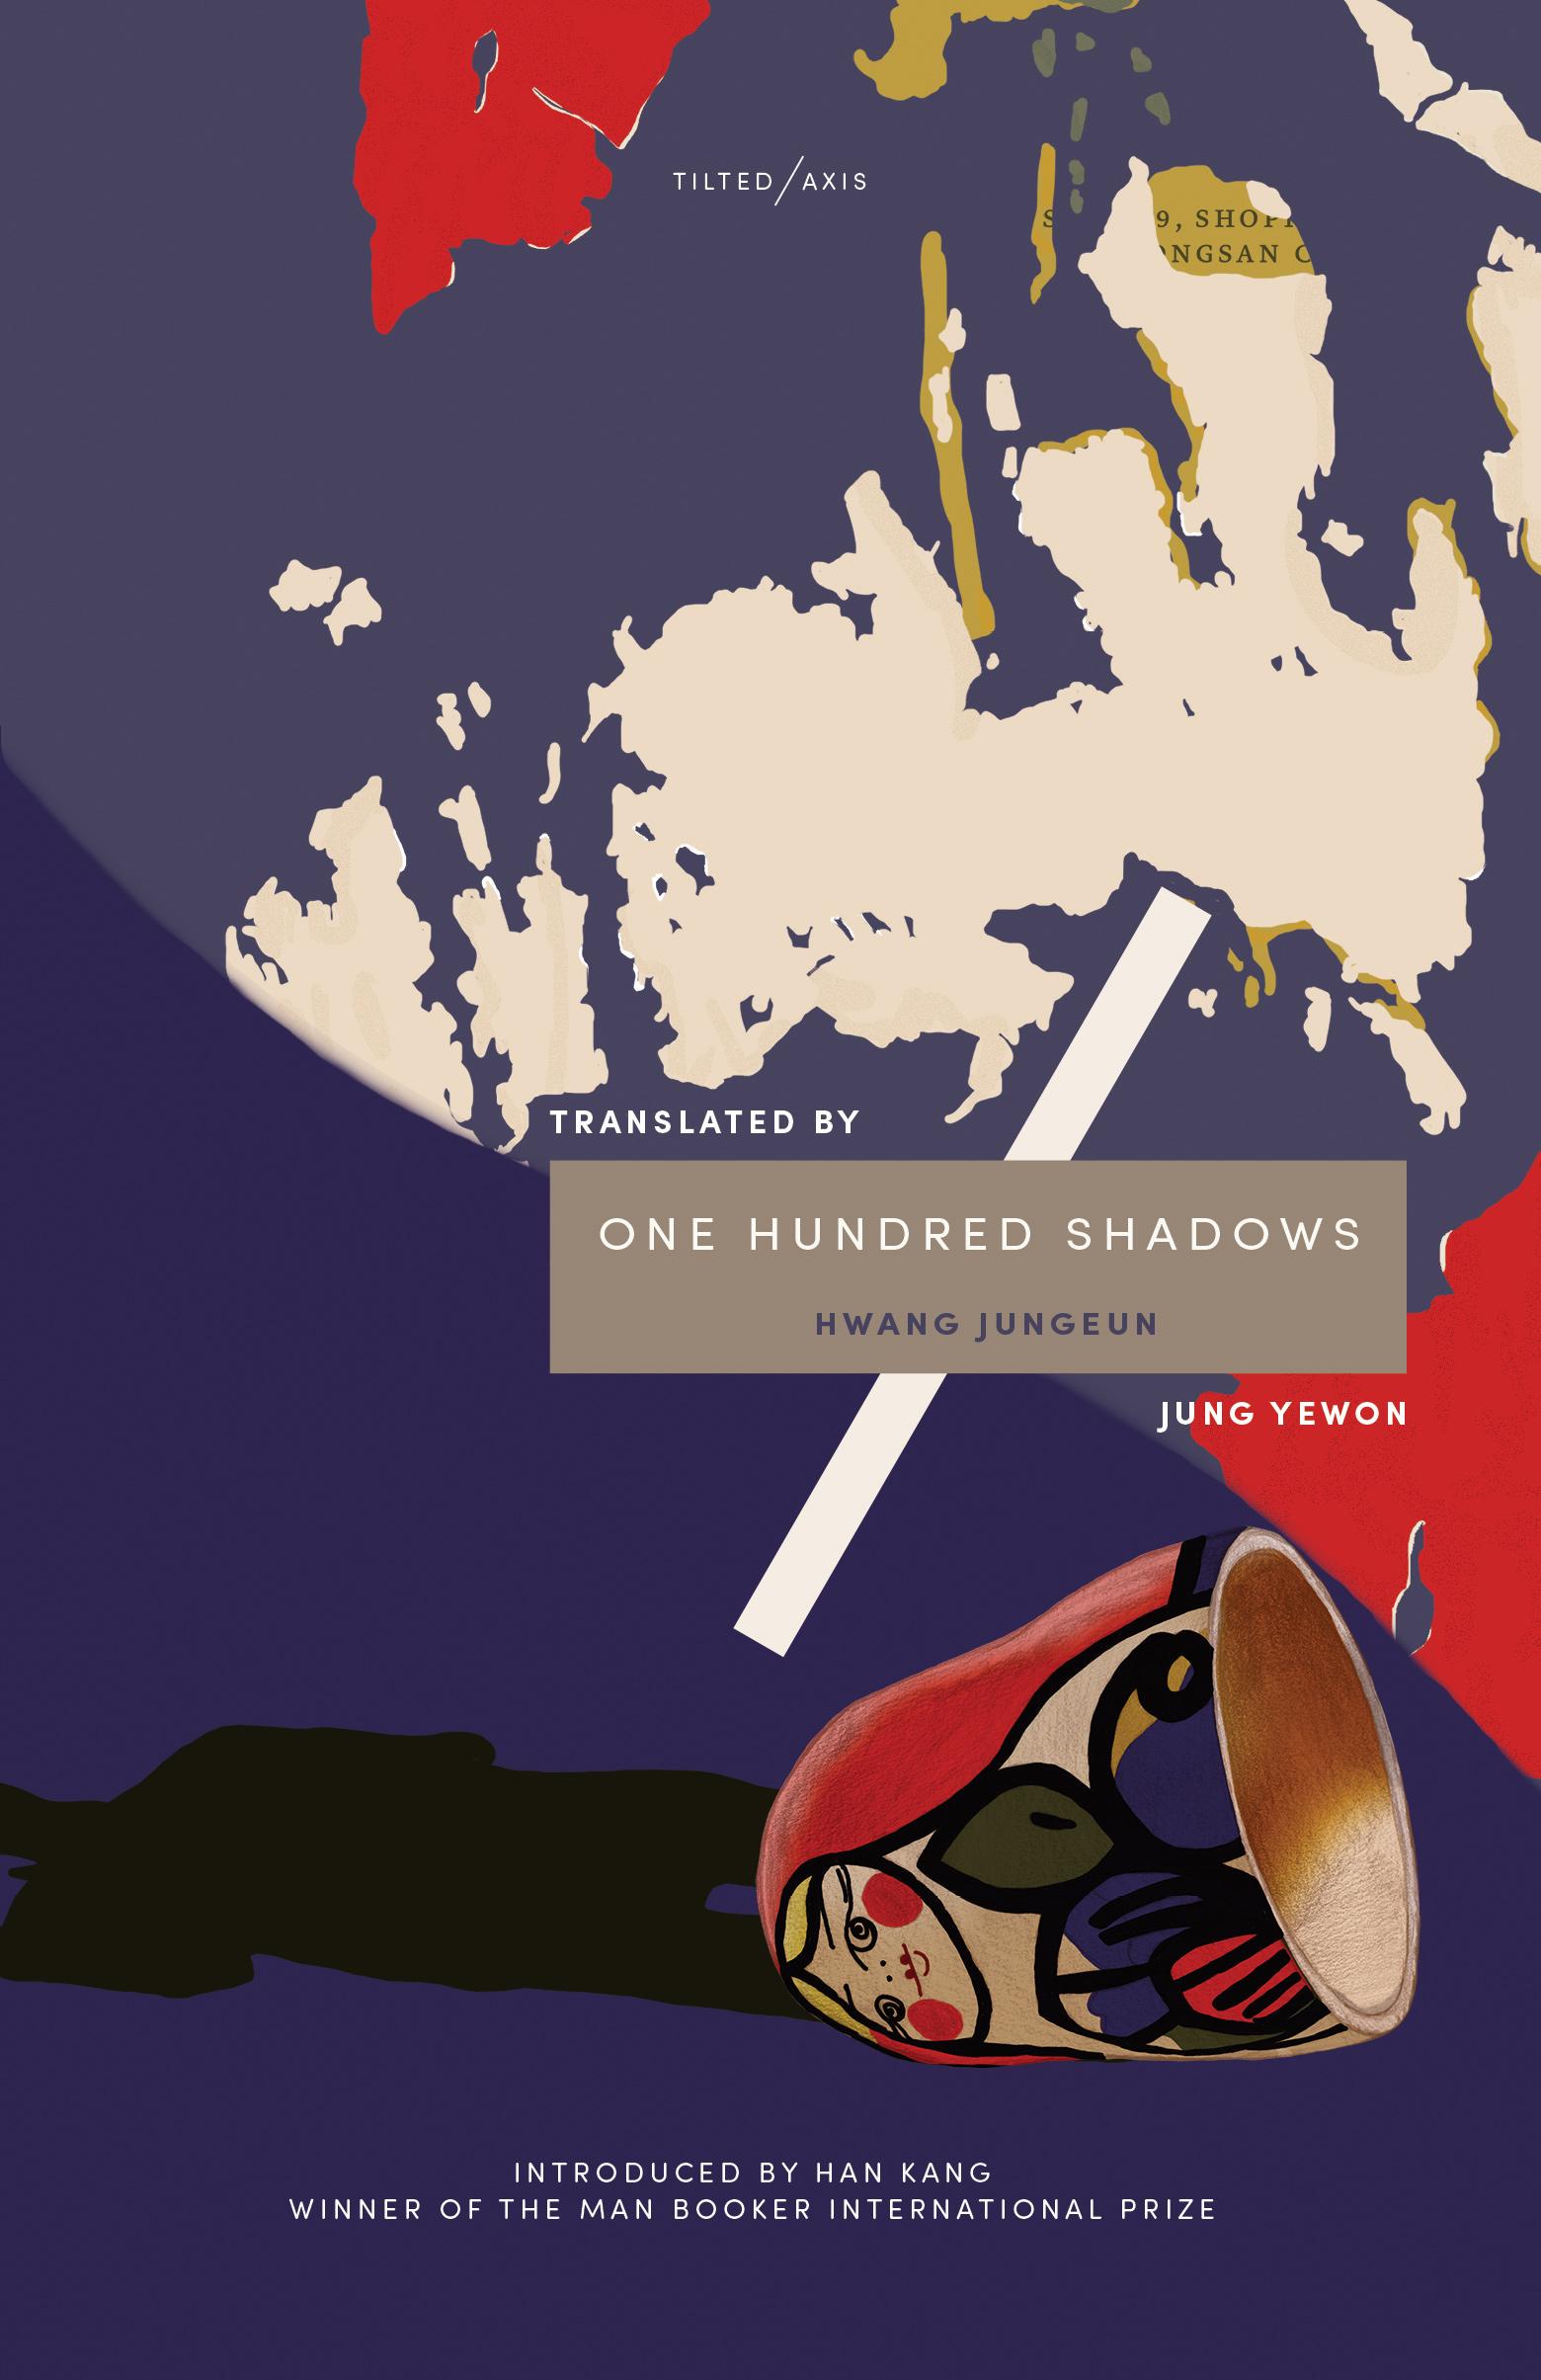 One Hundred Shadows by Hwang Jungeun